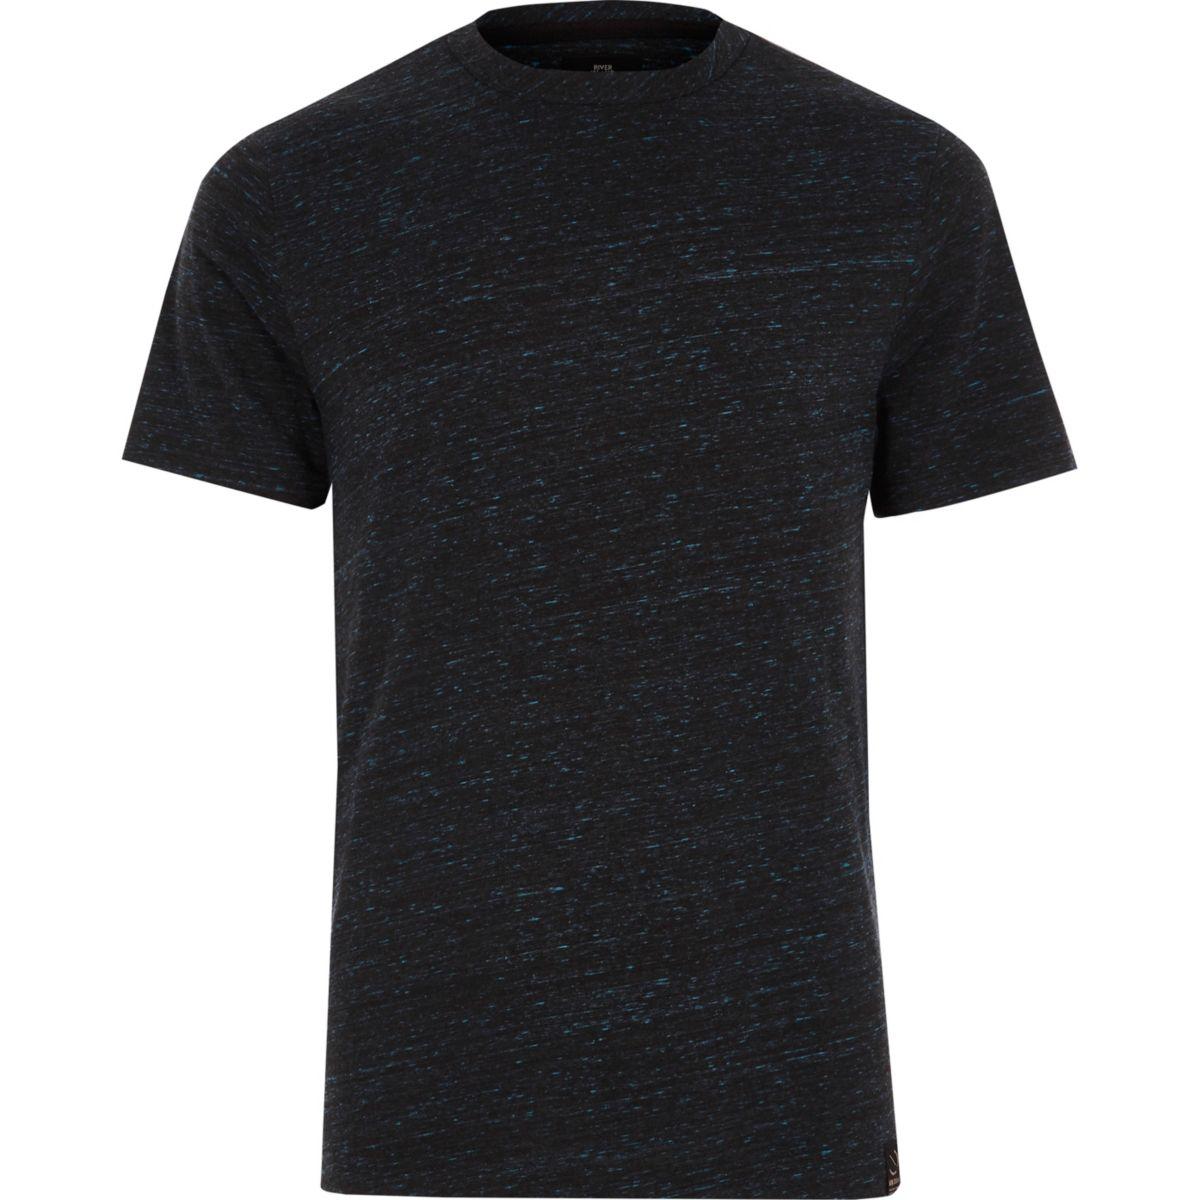 Navy textured slim fit crew neck T-shirt